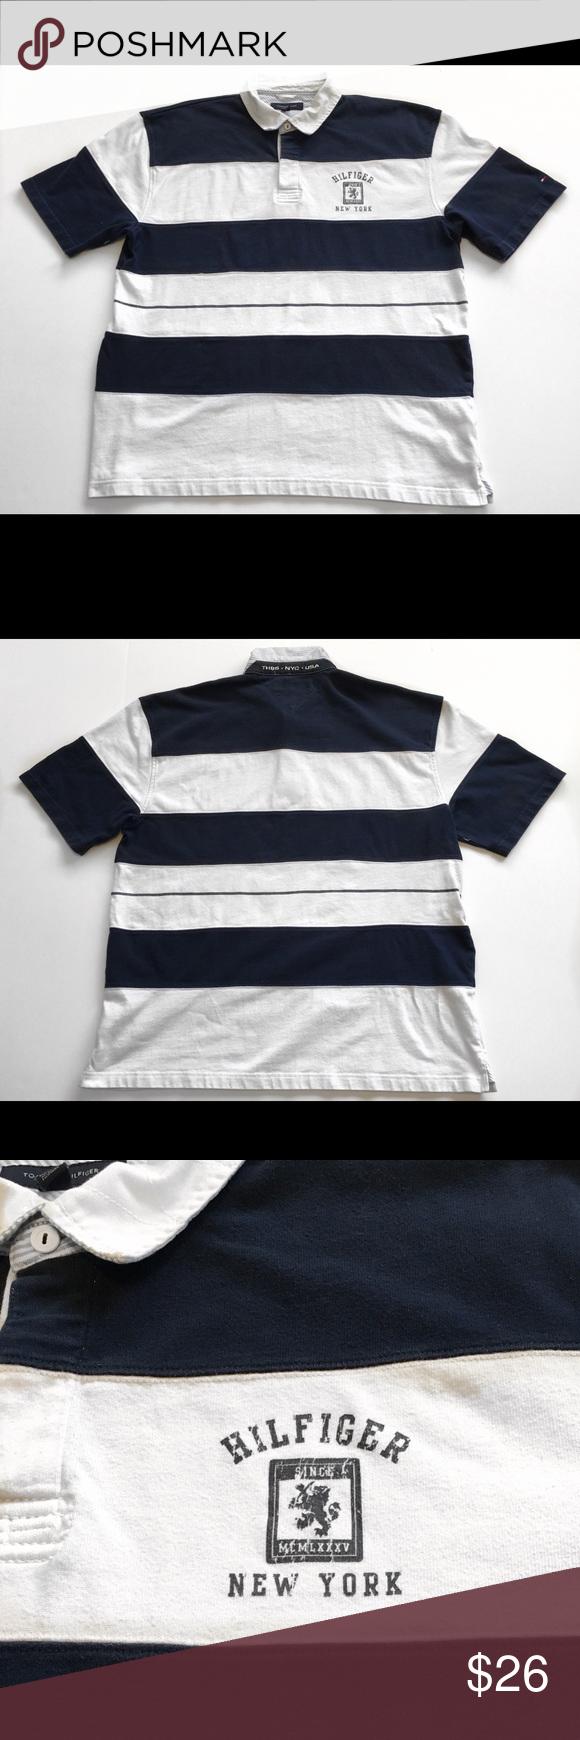 0cb4ae5f Vintage Tommy Hilfiger Rugby Short Sleeve Shirt Awesome Looking Vintage Tommy  Hilfiger Year 2000 Rugby/